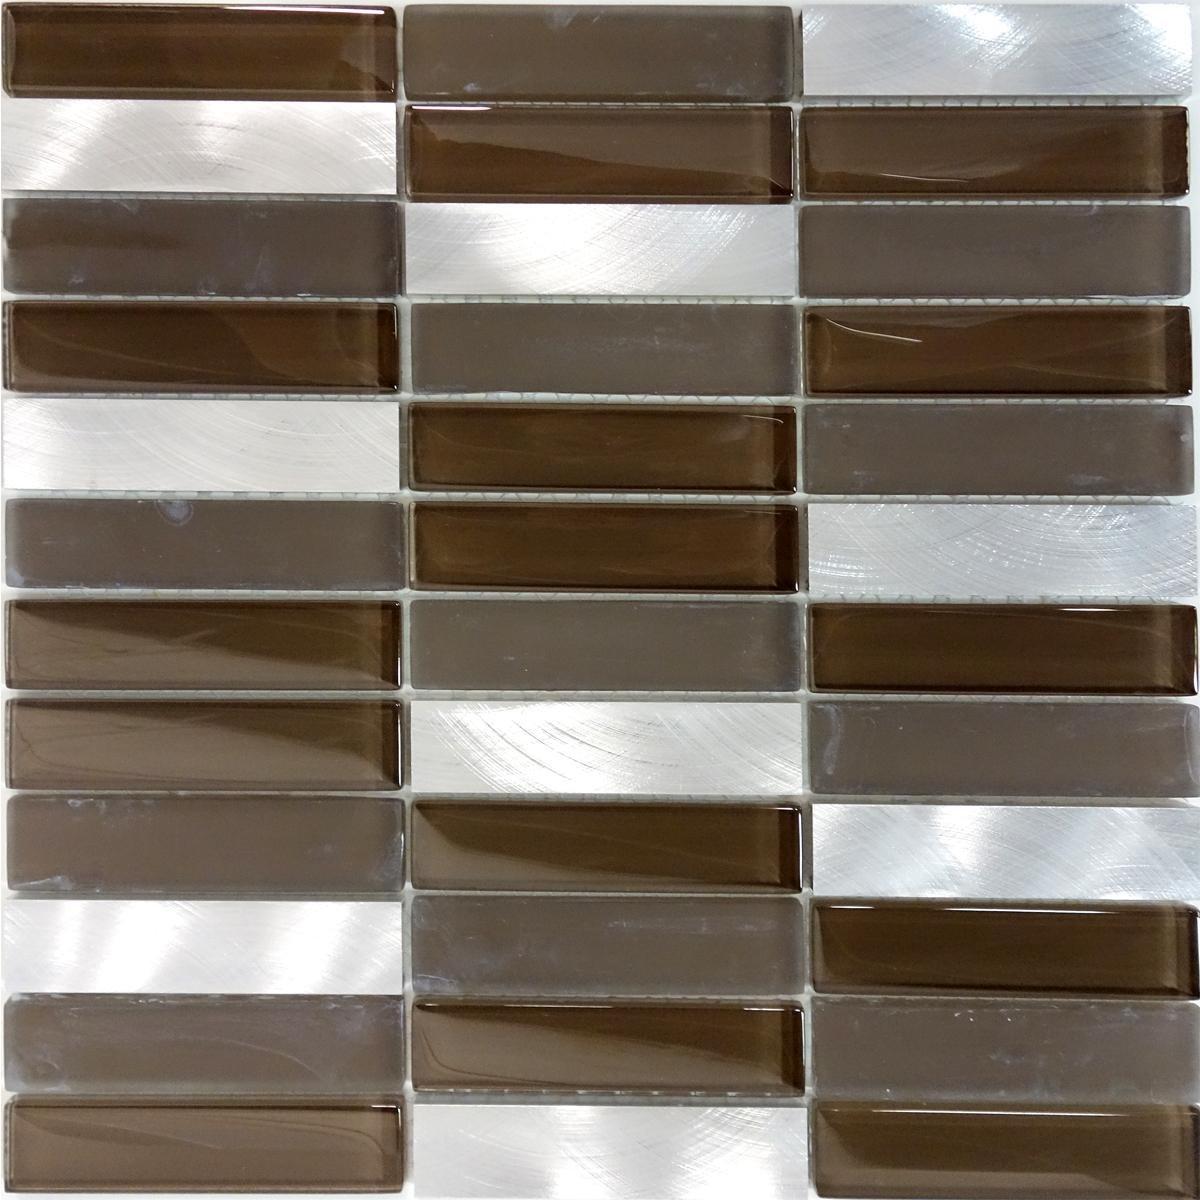 Modket TDH220MO Modern Brown Crystal Glass Blended Metallic Aluminum and Matted Glass Mosaic Tile Backsplash